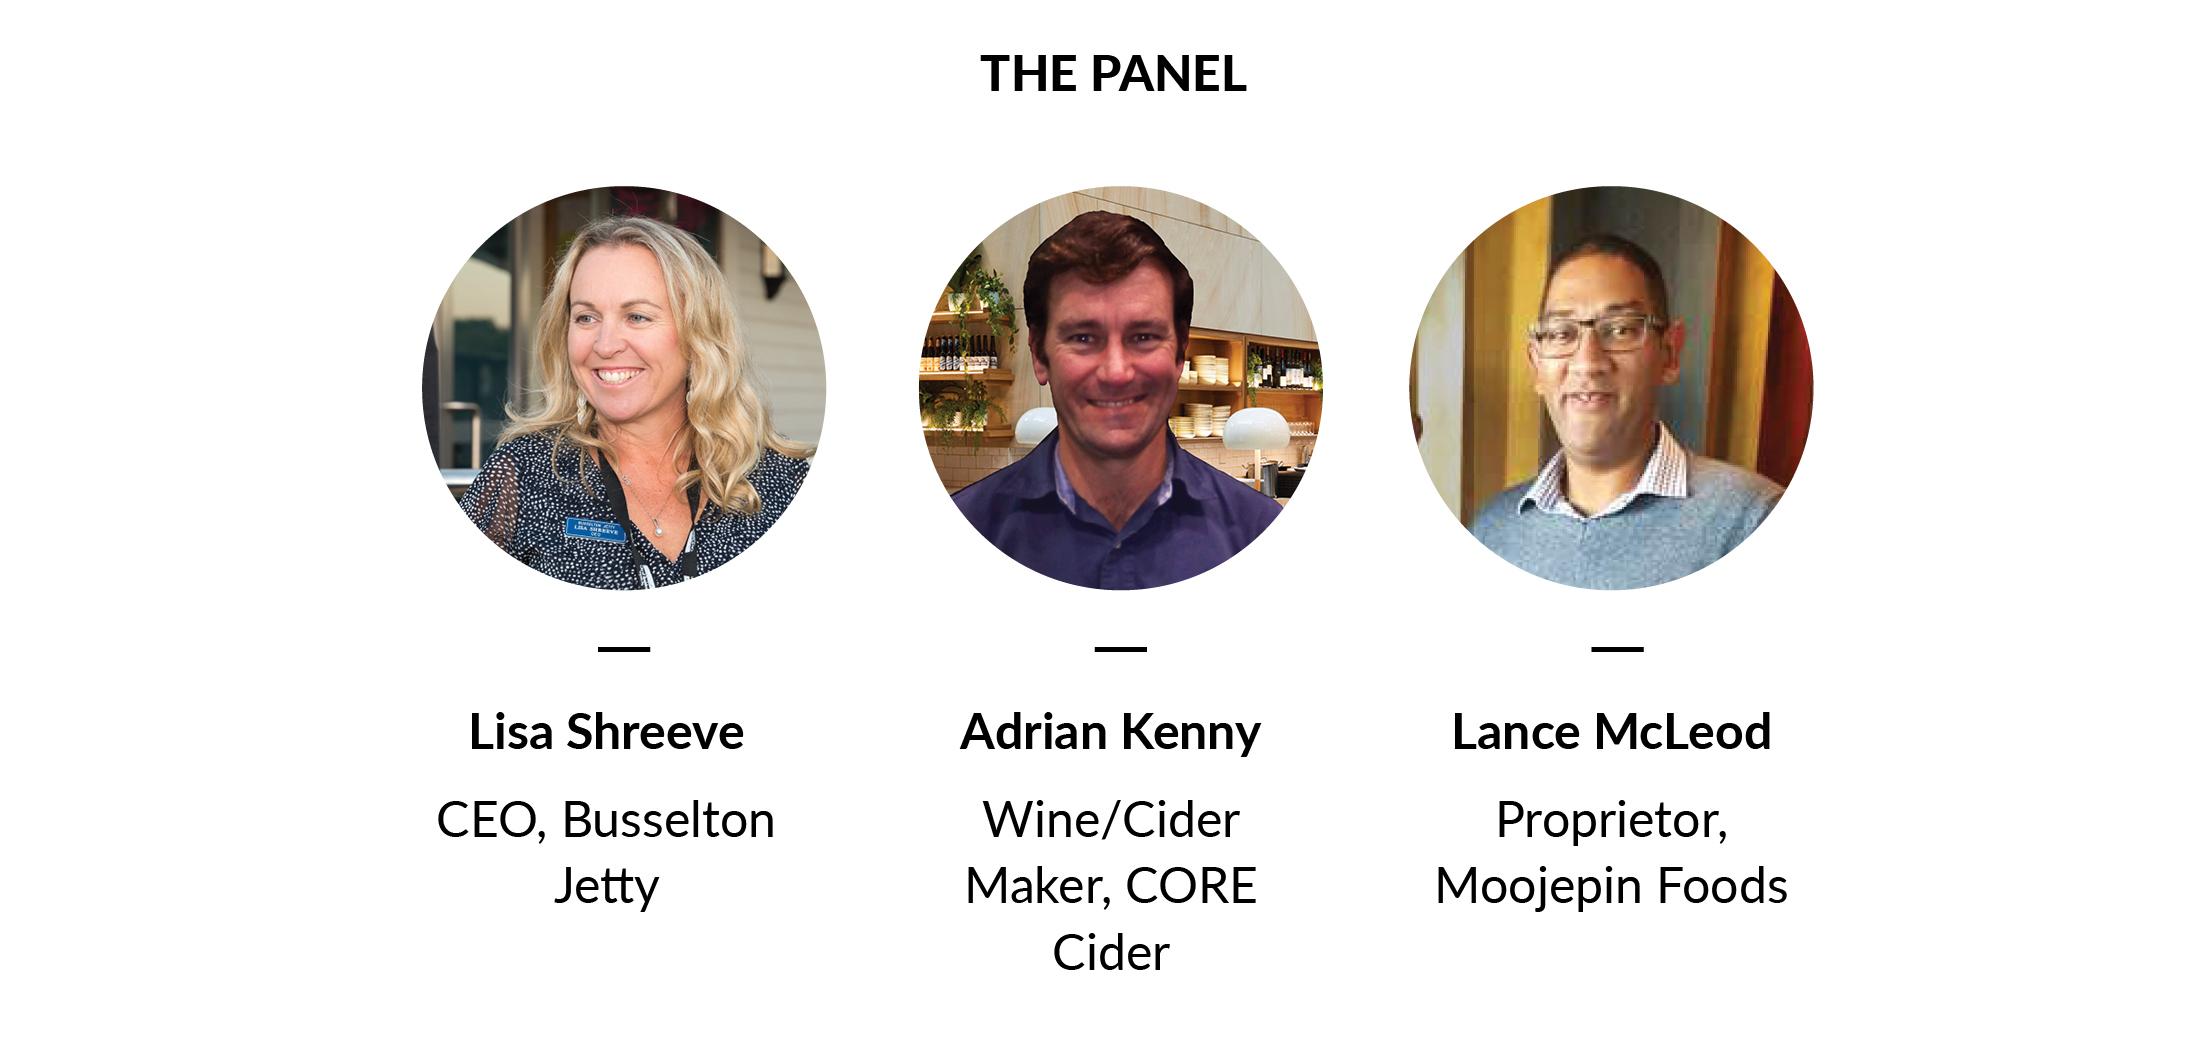 [Lisa Shreeve, CEO, Busselton Jetty] [Adrian Kenny, Wine/Cider Maker, CORE Cider] [Lance McLeod, Proprietor, Moojepin Foods]